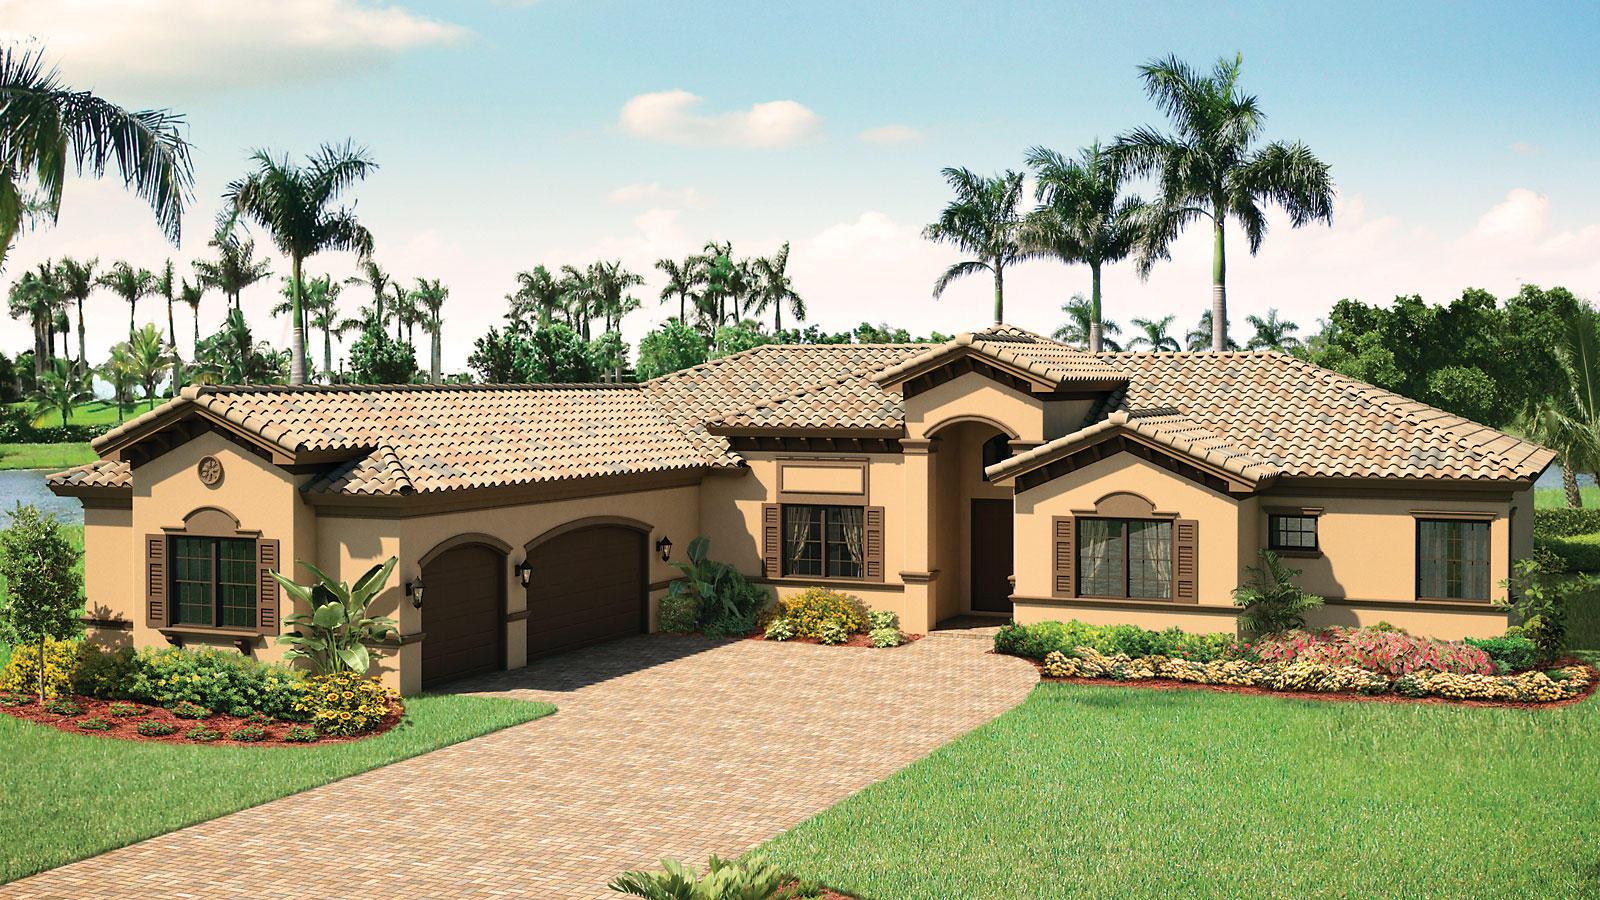 West Palm Beach Fl 33412 889 975 Trulia Estimate Refinance Your Home 7828 Arbor Crest Way